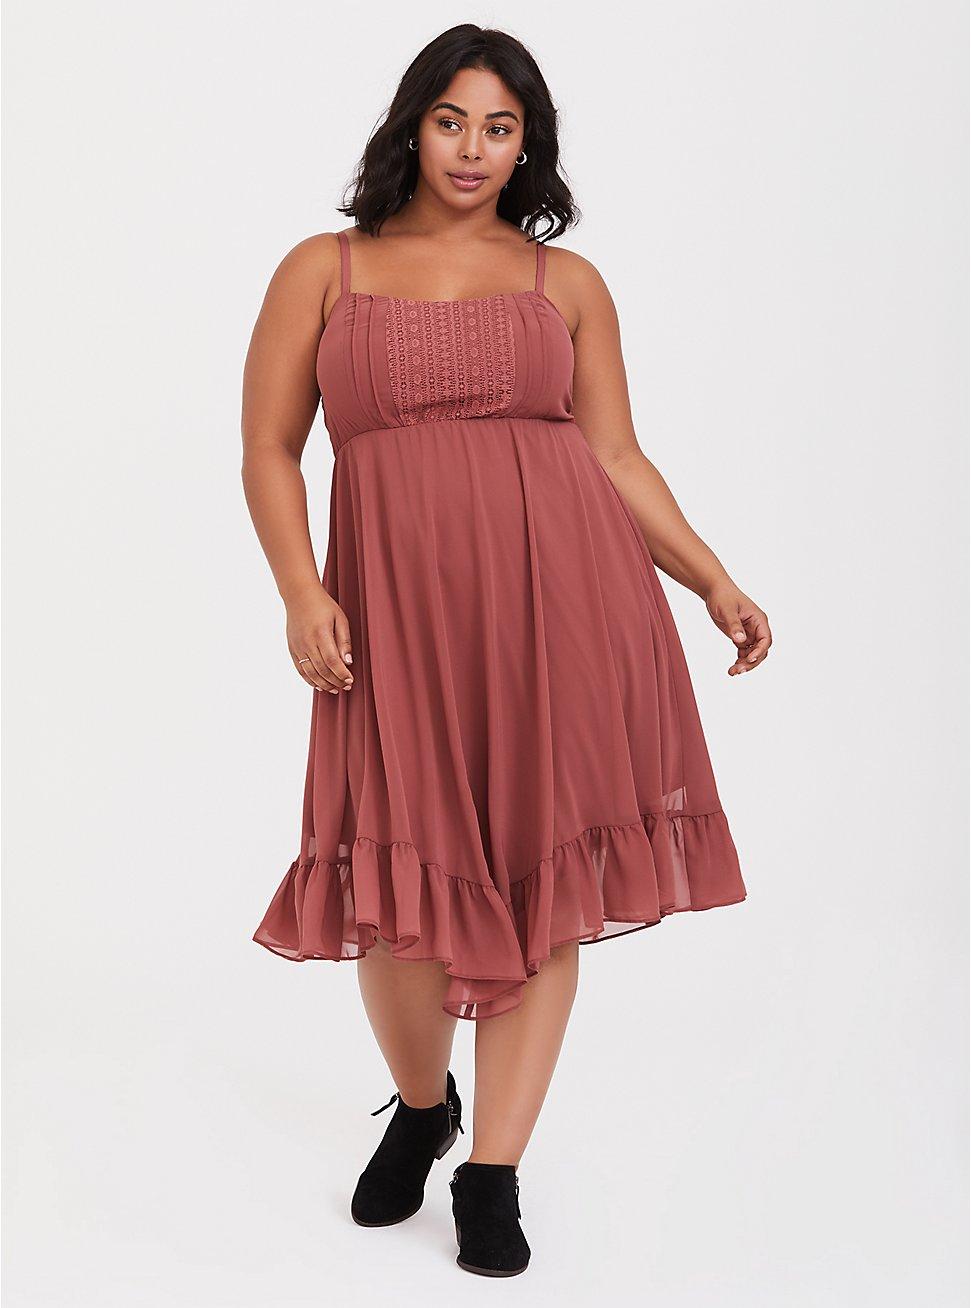 Plus Size Rose Pink Chiffon Lace Handkerchief Midi Dress, APPLE BUTTER PINK, hi-res